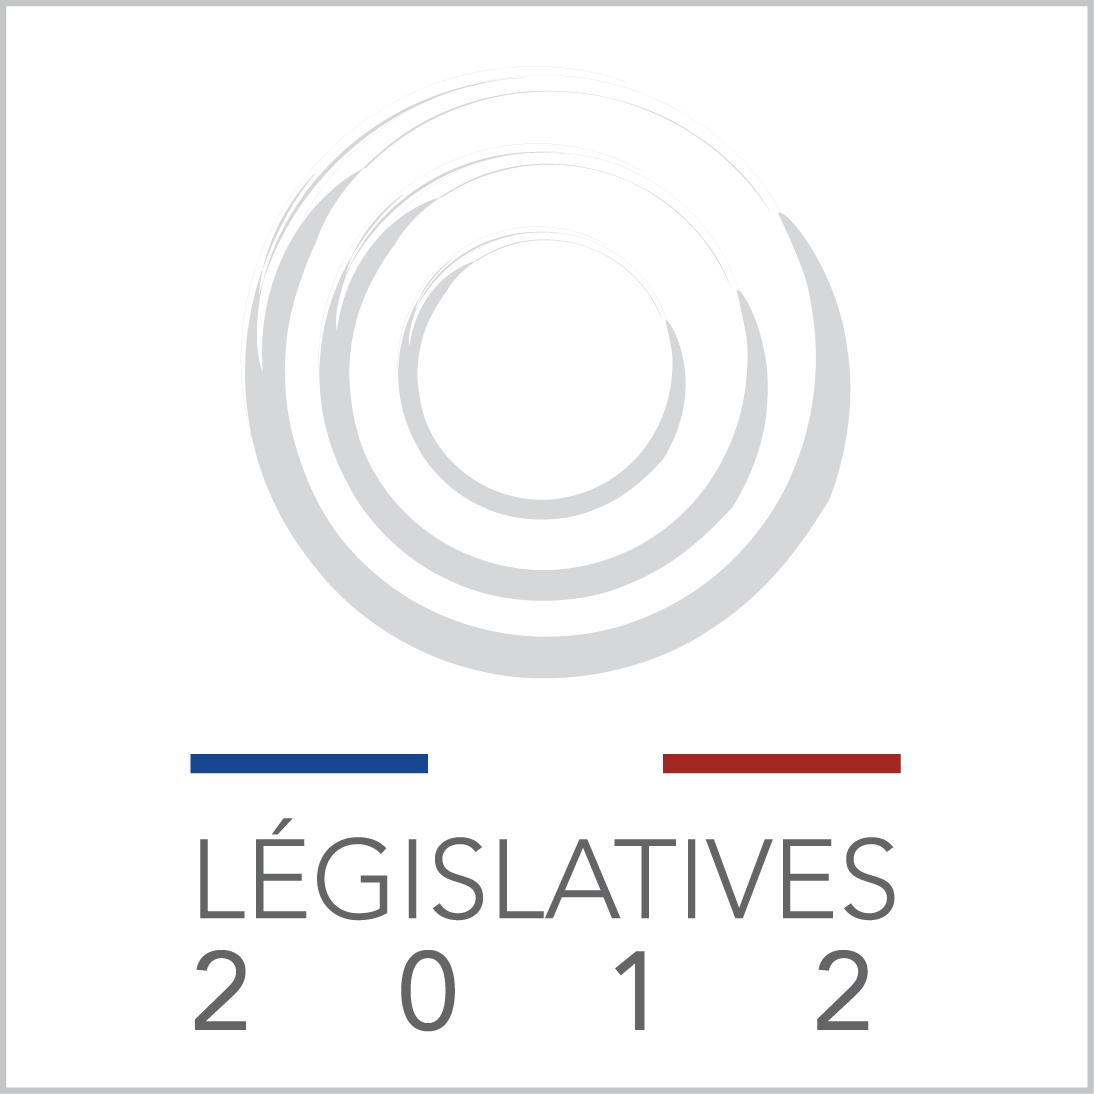 legislative2012